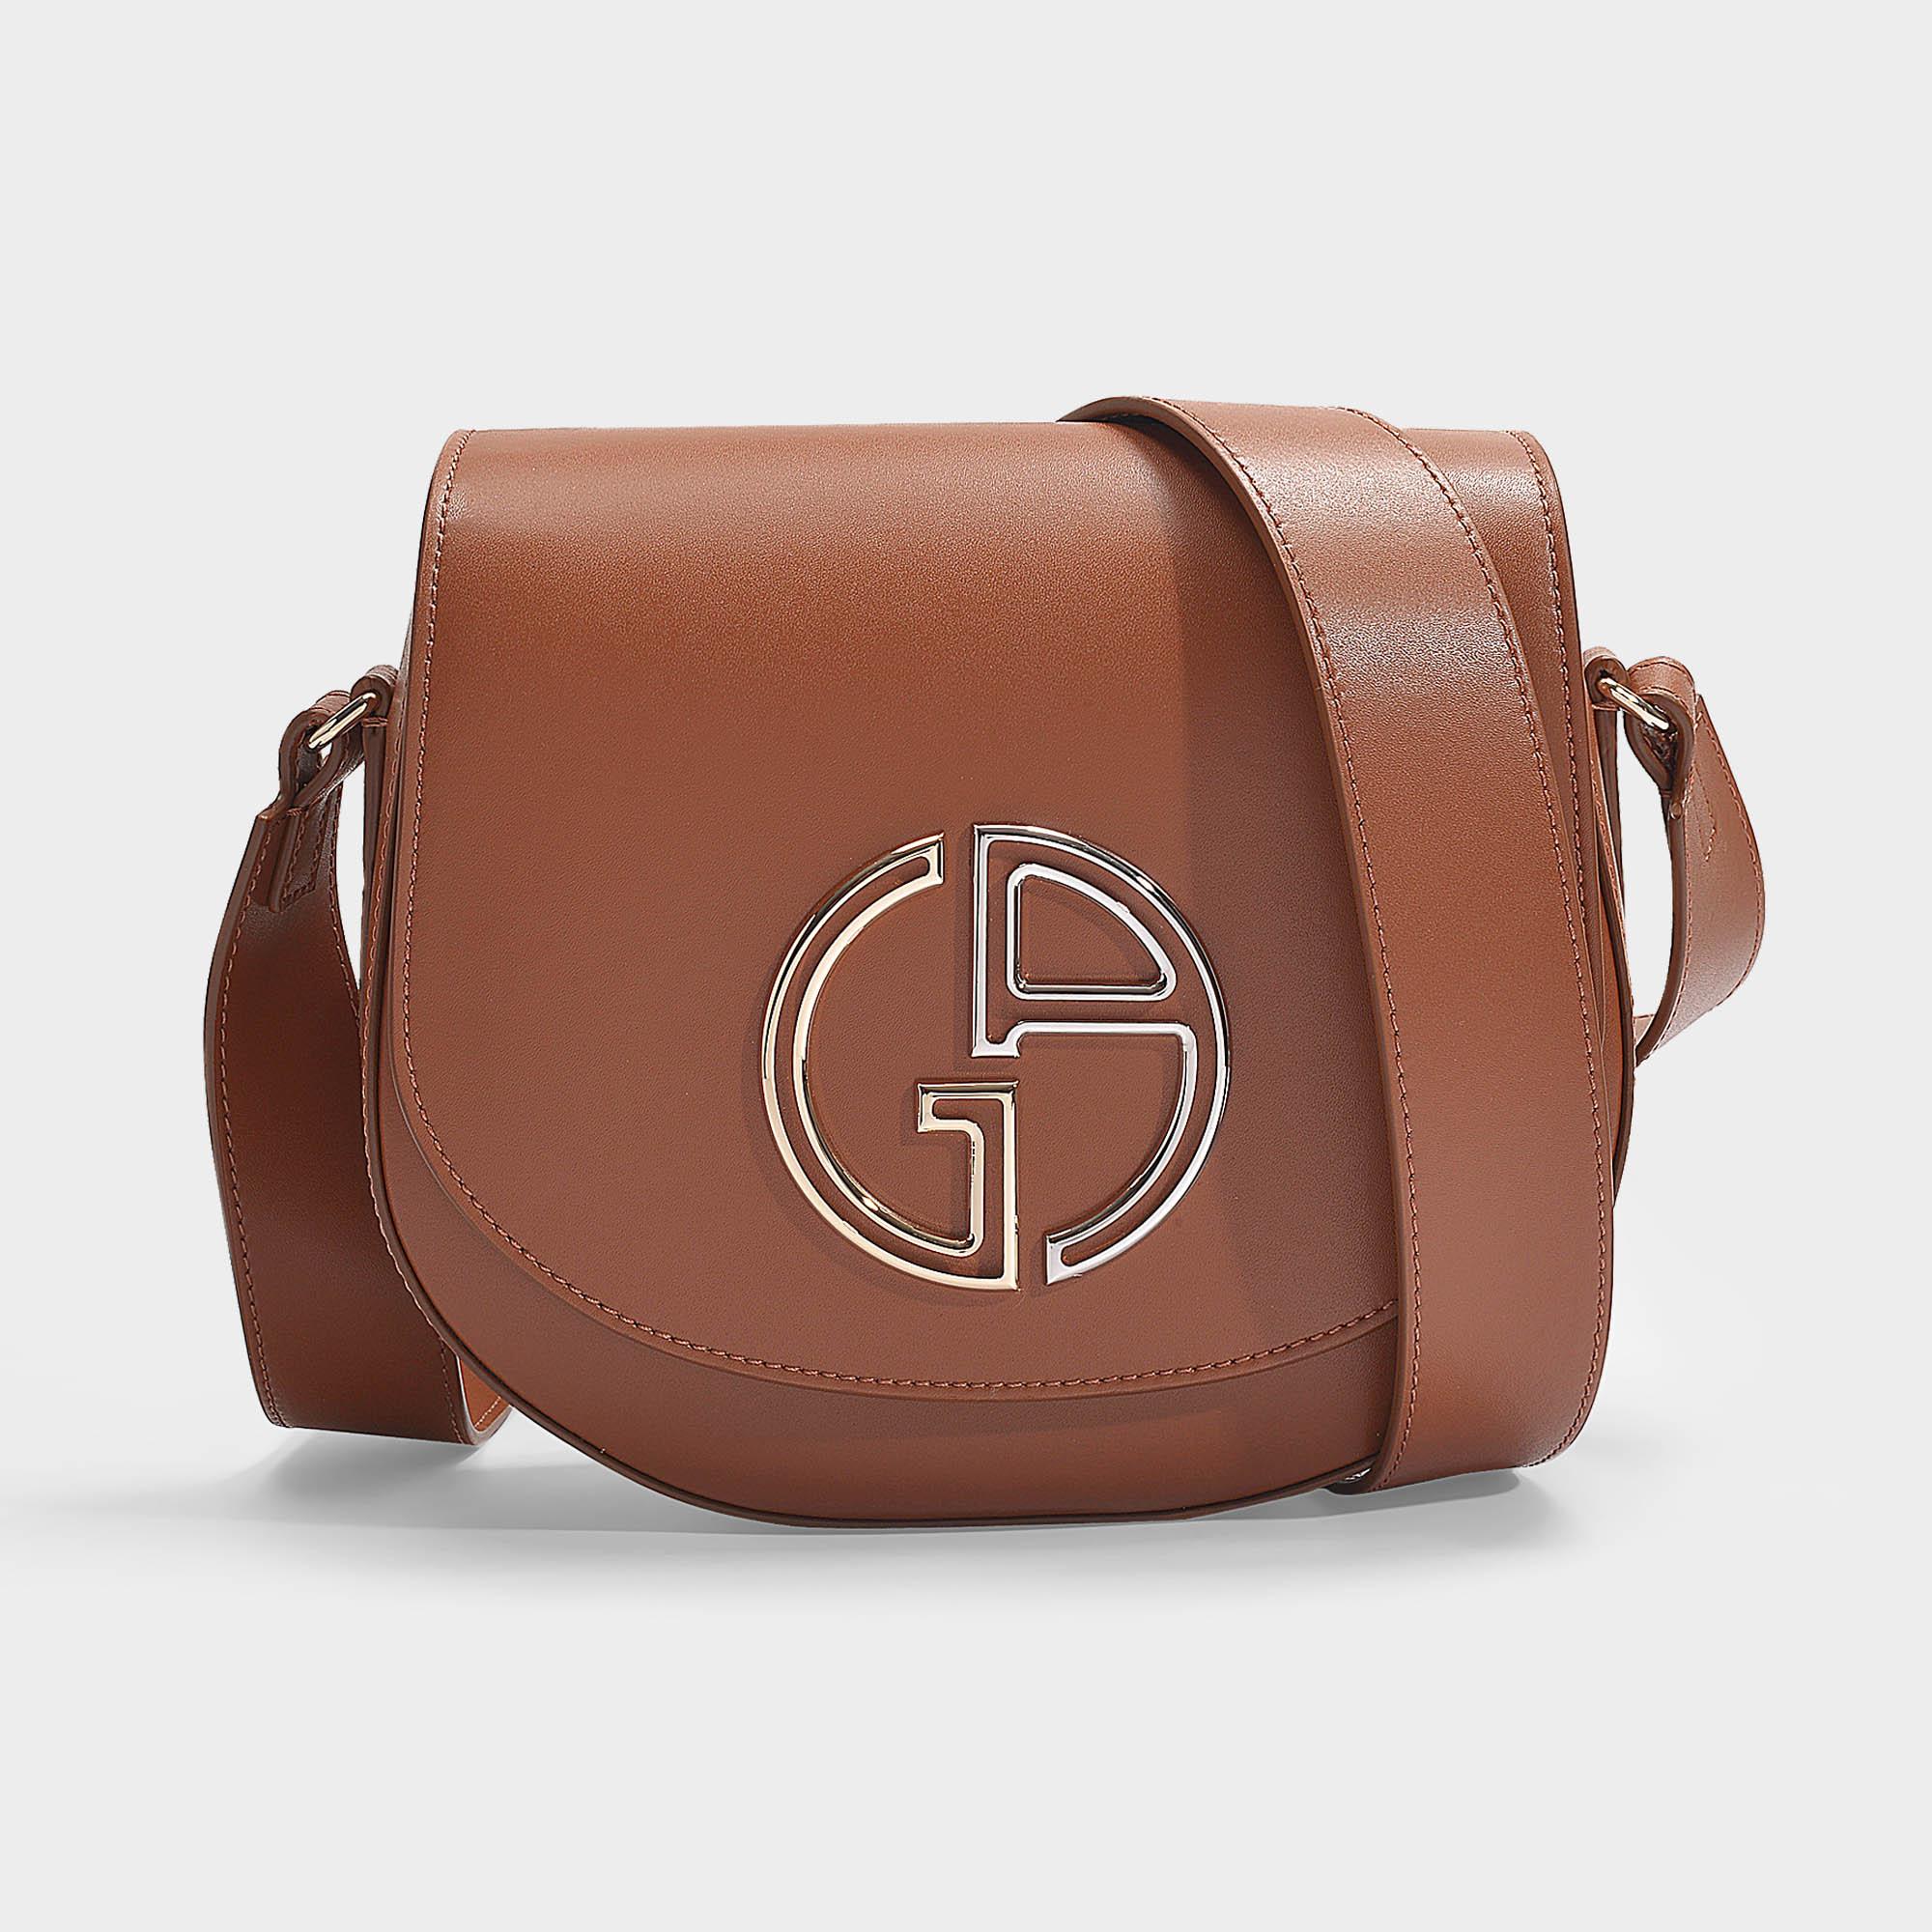 Giorgio Armani   Medium Shoulder Bag In Black Calfskin In Brown